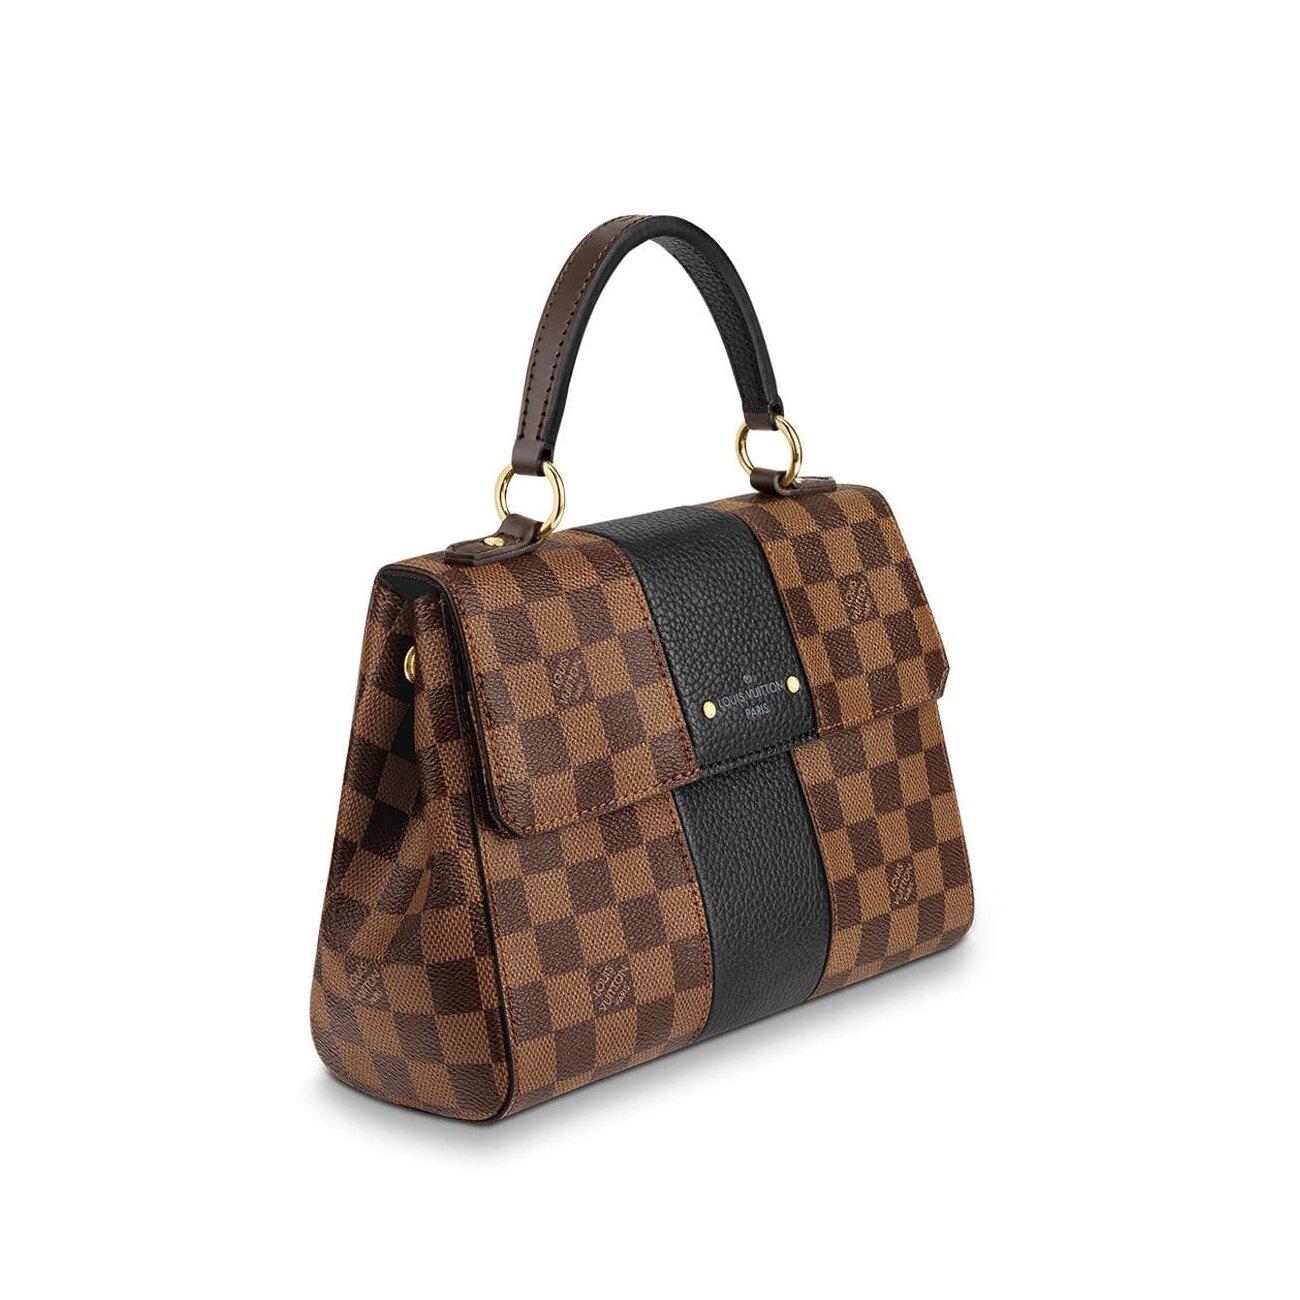 【Chiu189英歐代購】Louis Vuitton BOND STREET BB 棋盤格紋郵差包 N41073